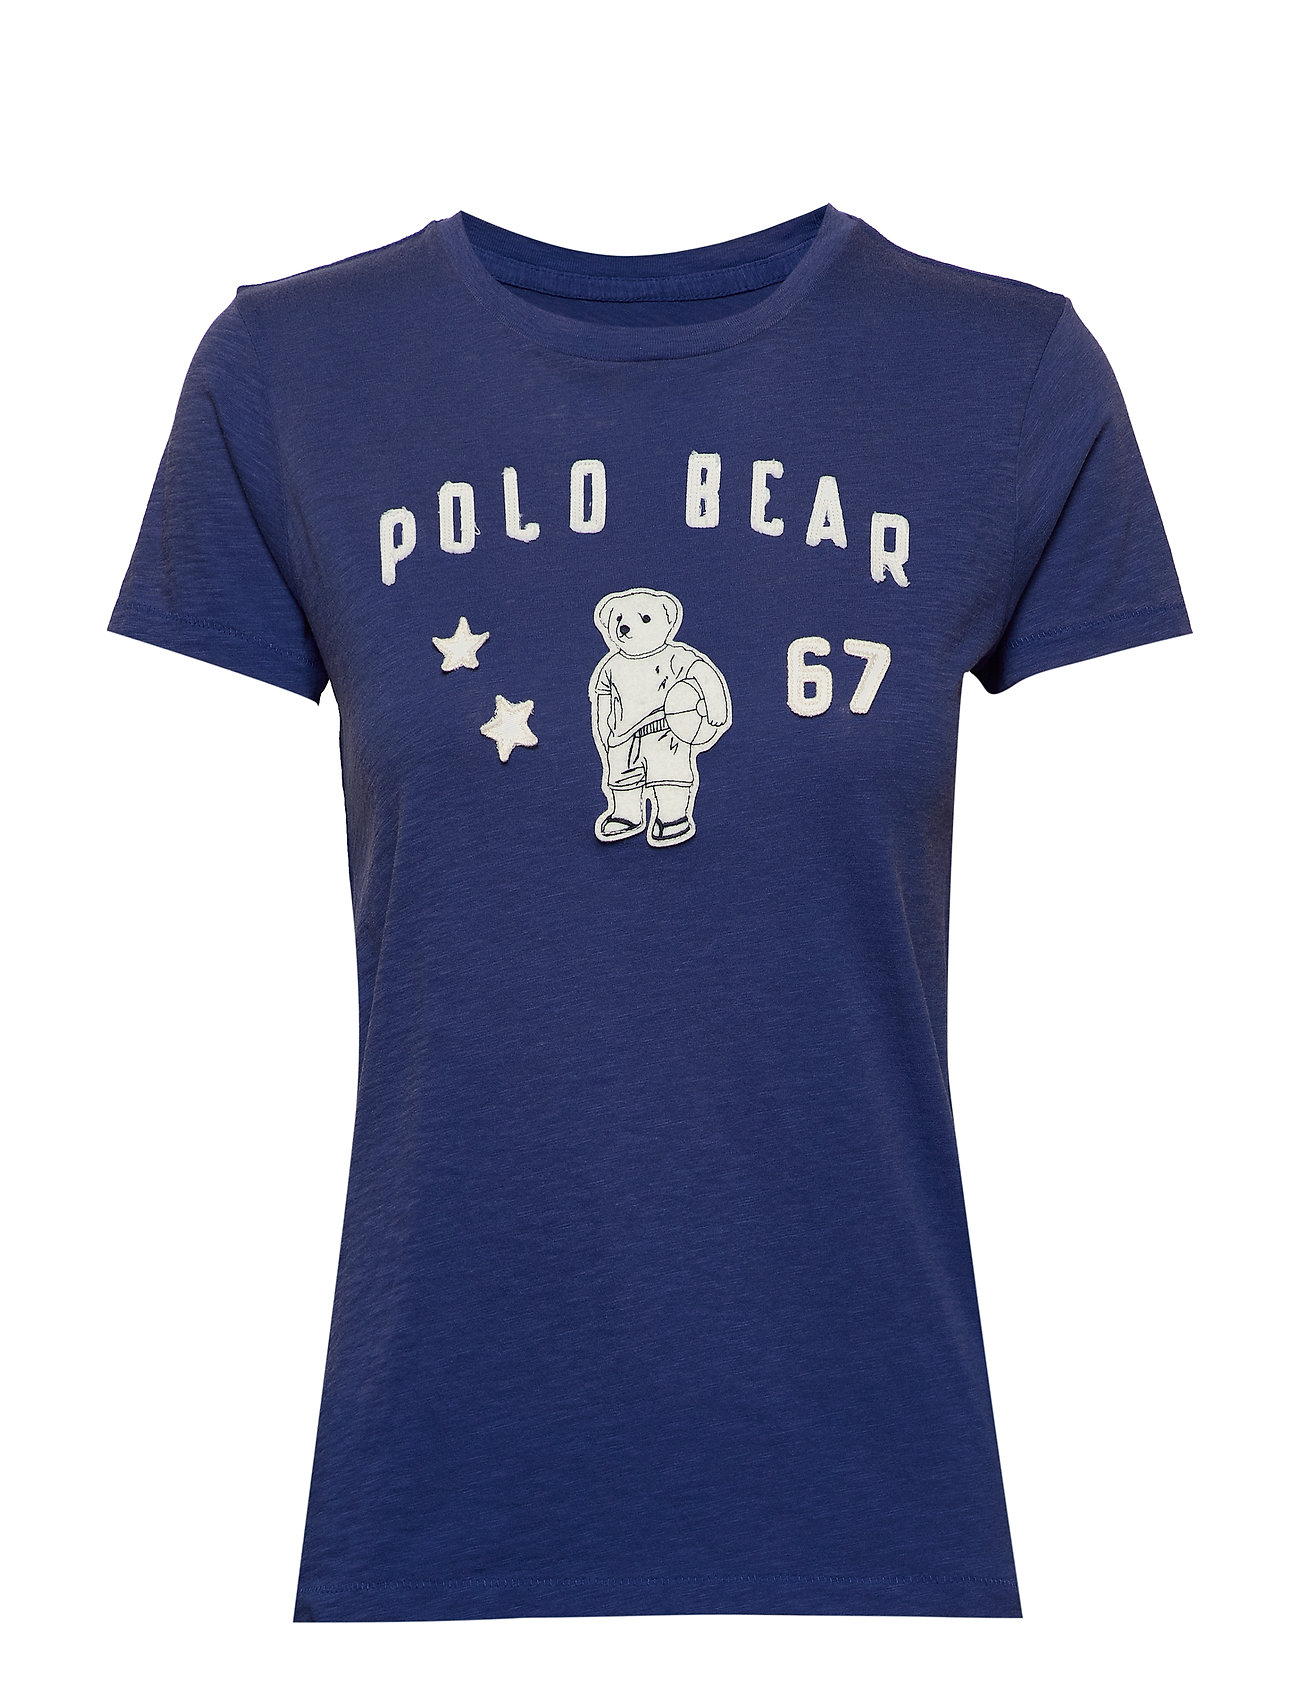 Polo Ralph Lauren Polo Bear Patch Jersey Tee - ROYAL NAVY